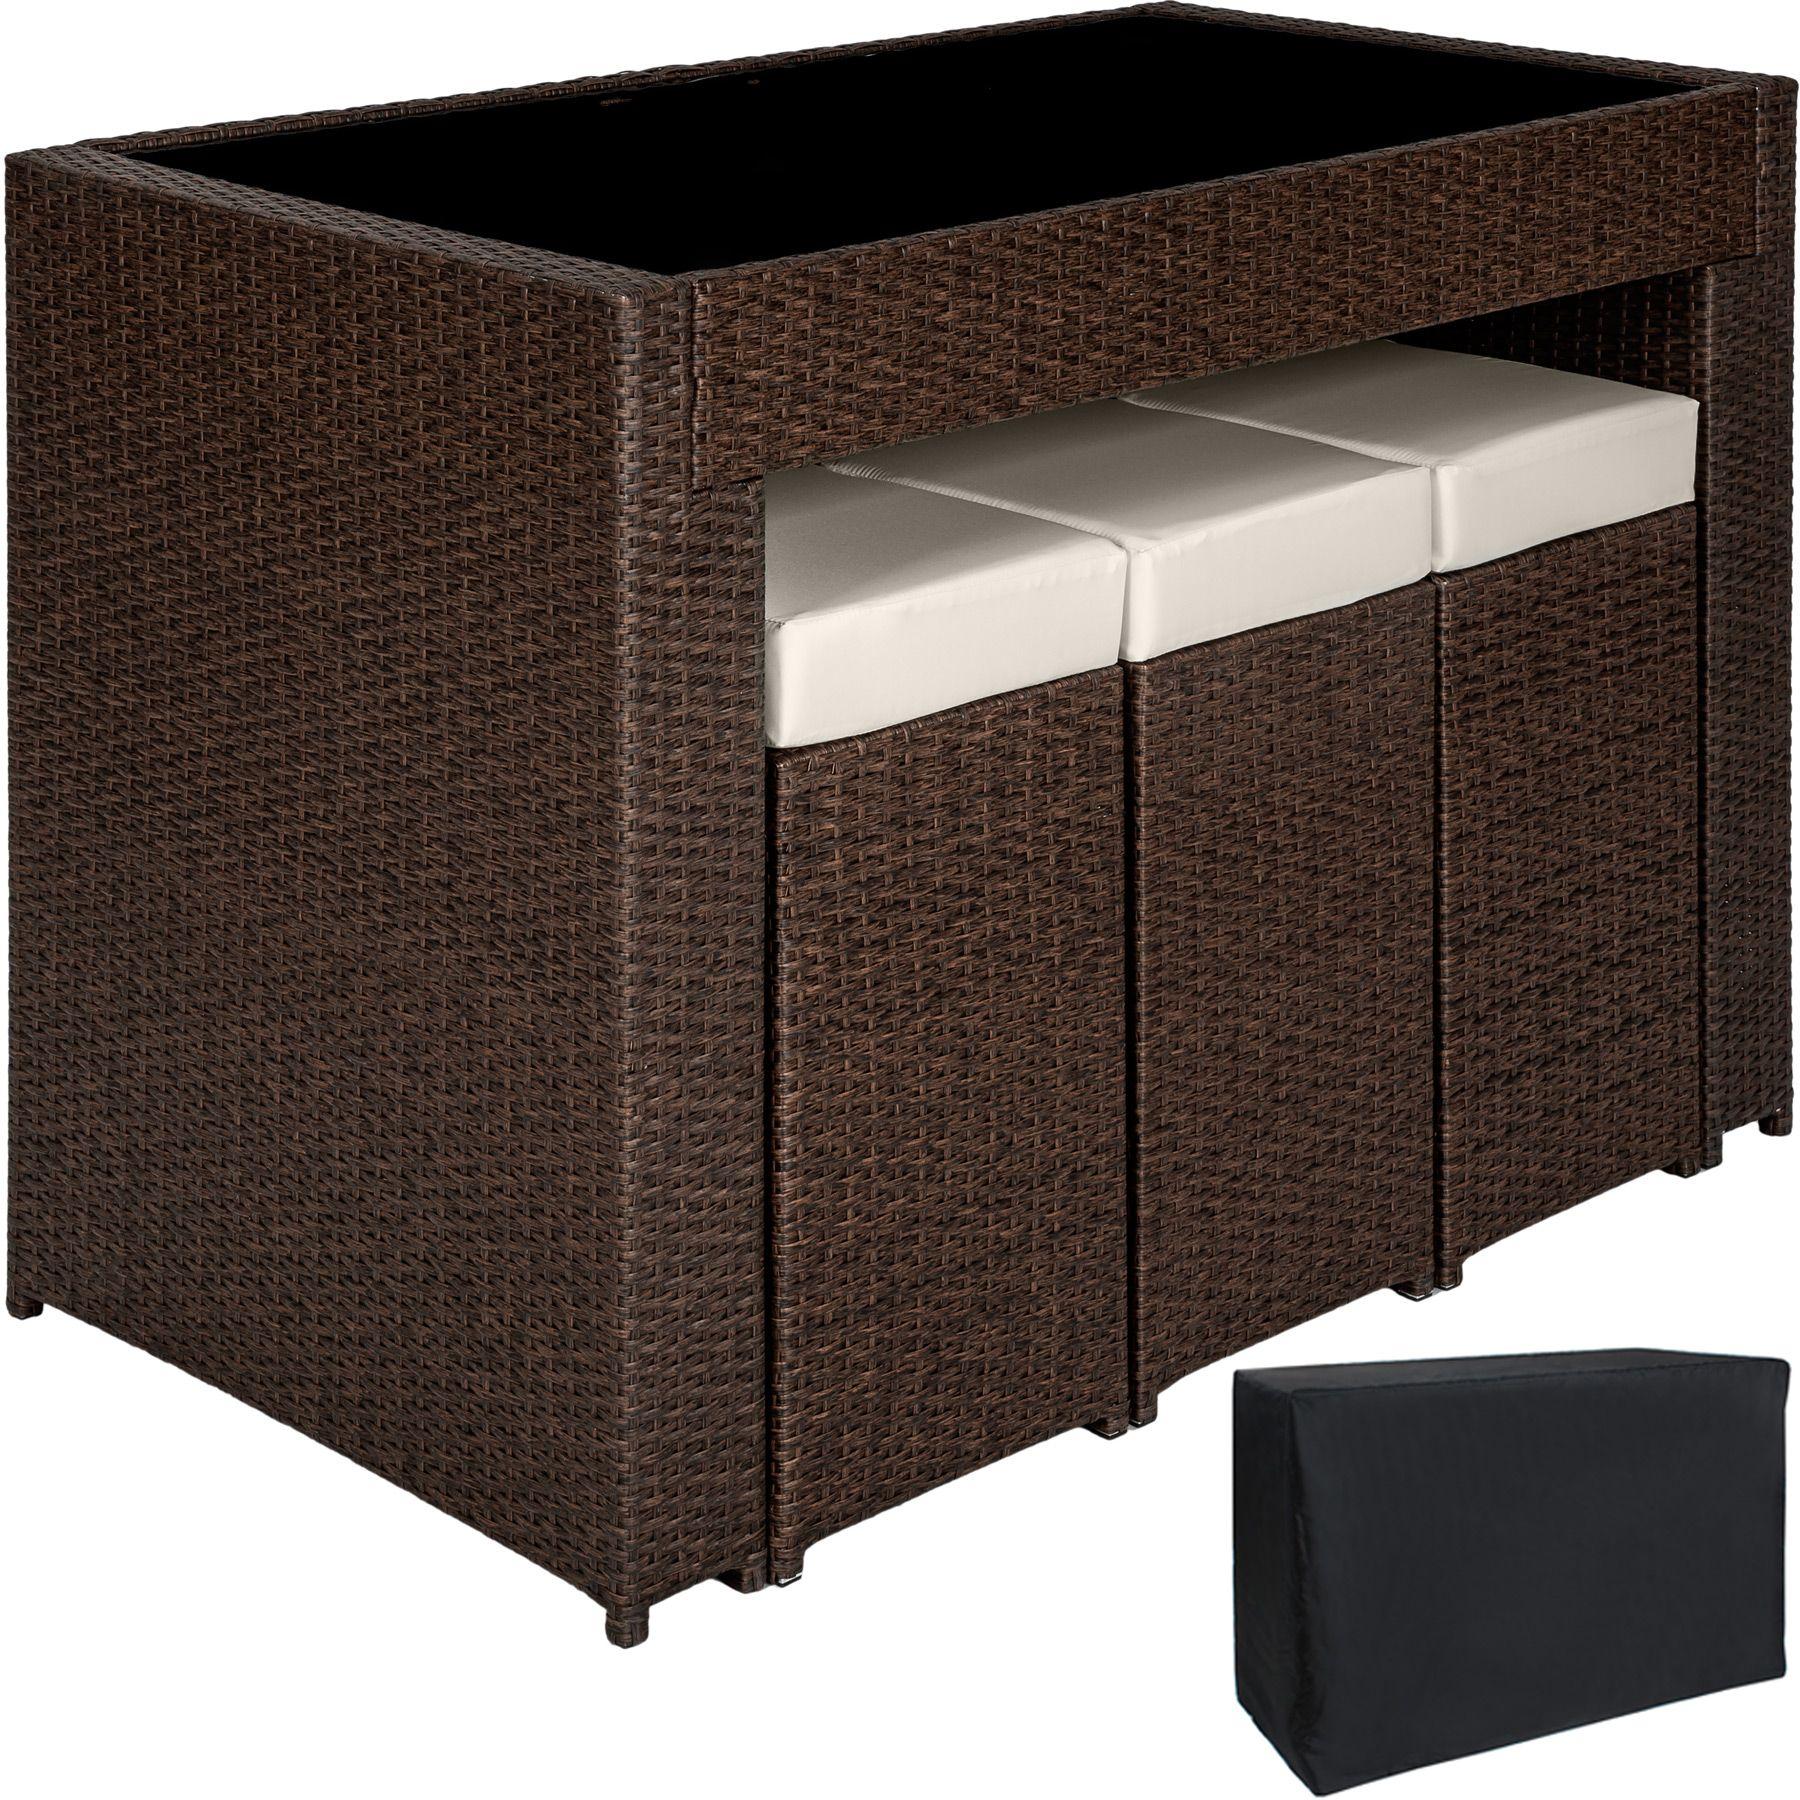 poly rattan aluminium barset mit 6 barhocker sitzgruppe lounge theke tisch ebay. Black Bedroom Furniture Sets. Home Design Ideas